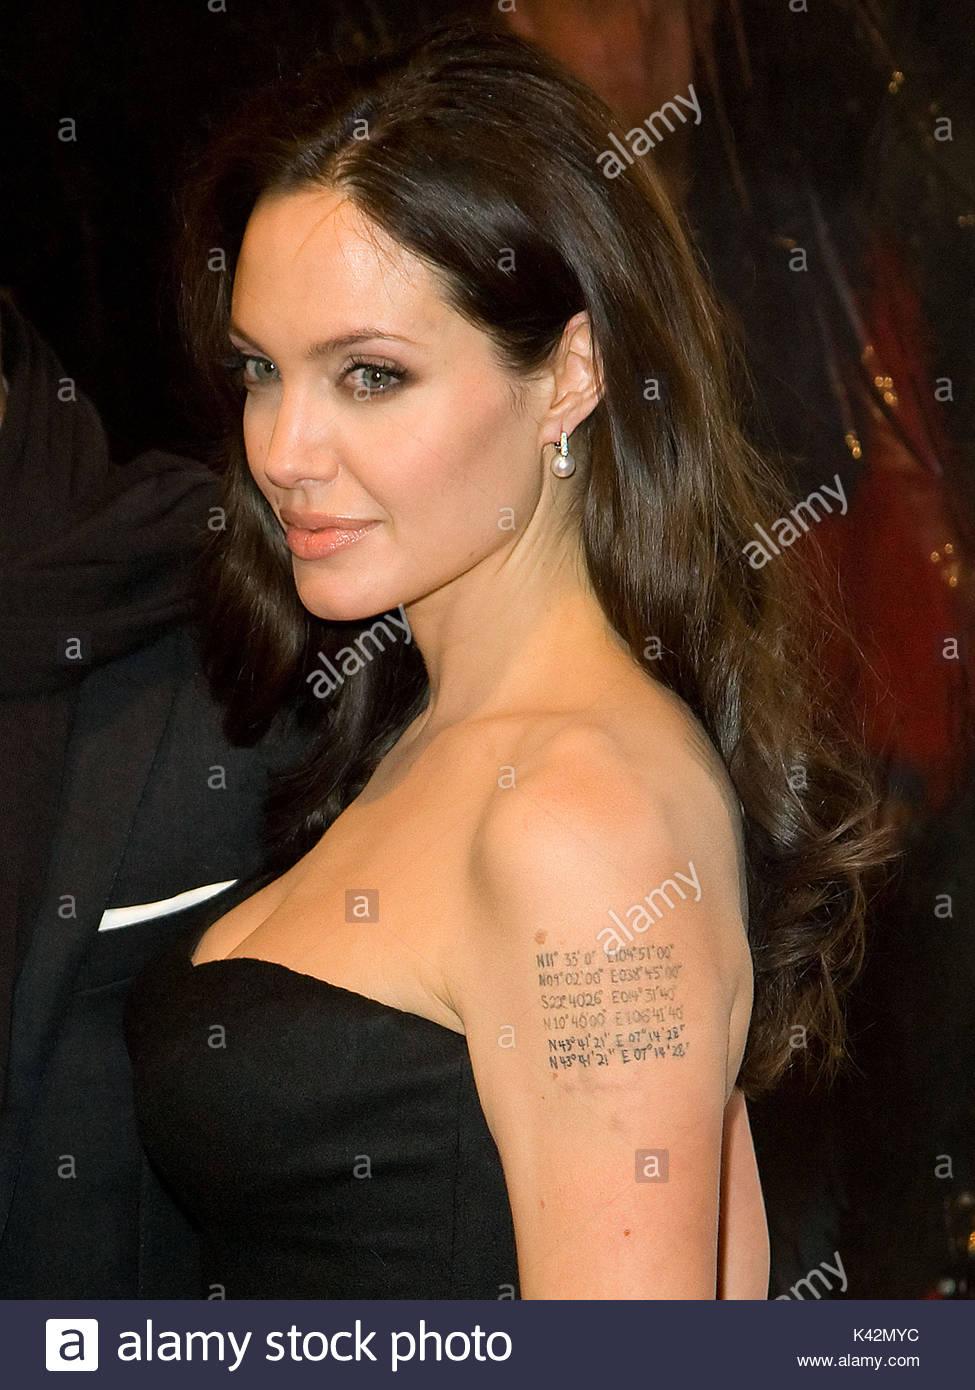 Angelina Jolie. Angelina Jolie's tattoos and their ...